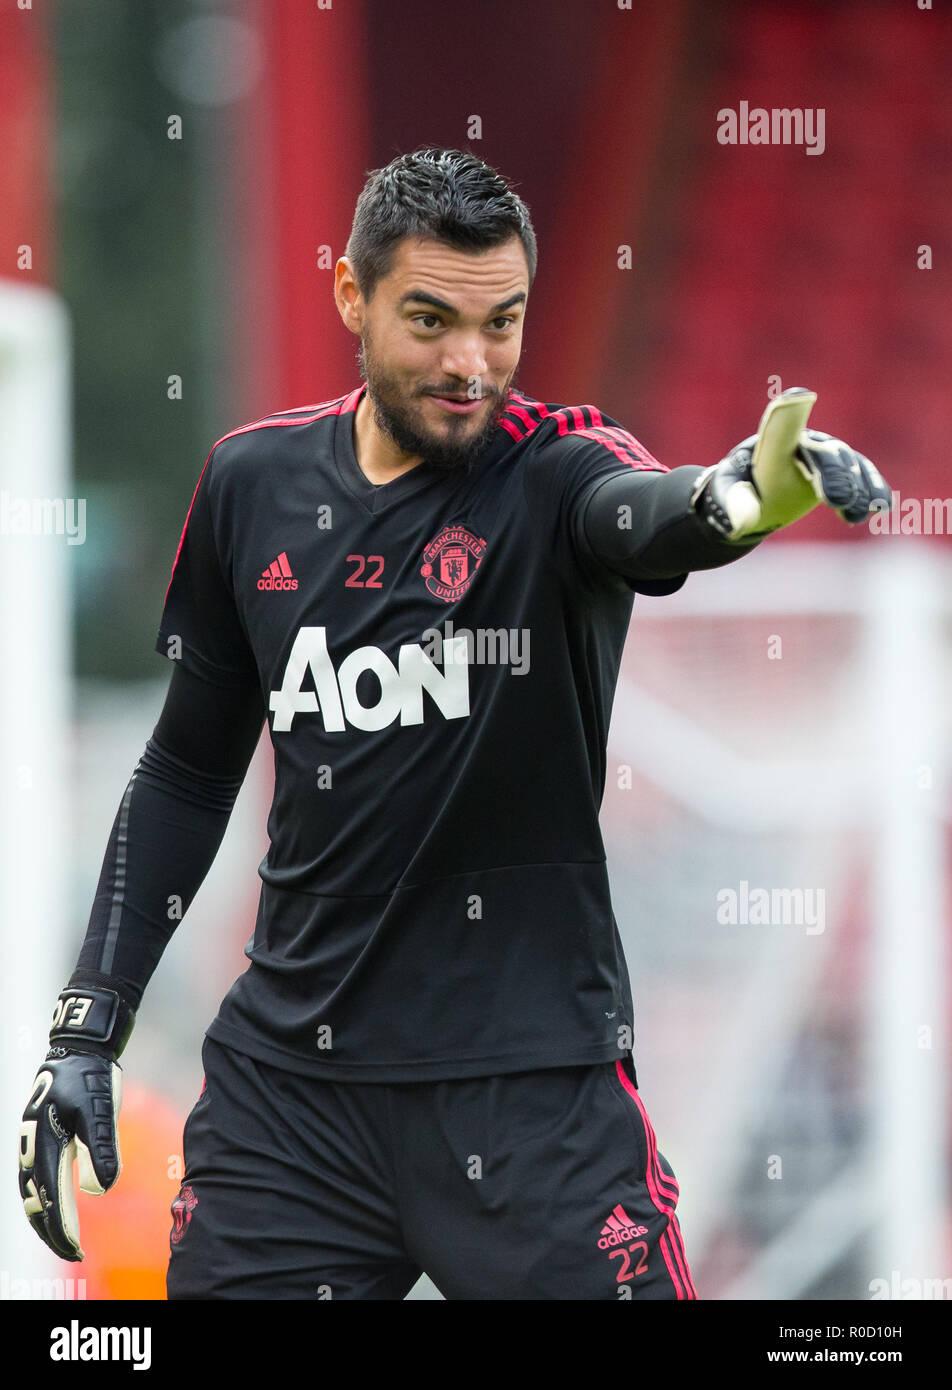 e3eb25bddab Manchester United Goalkeeper Sergio Romero Stock Photos   Manchester ...